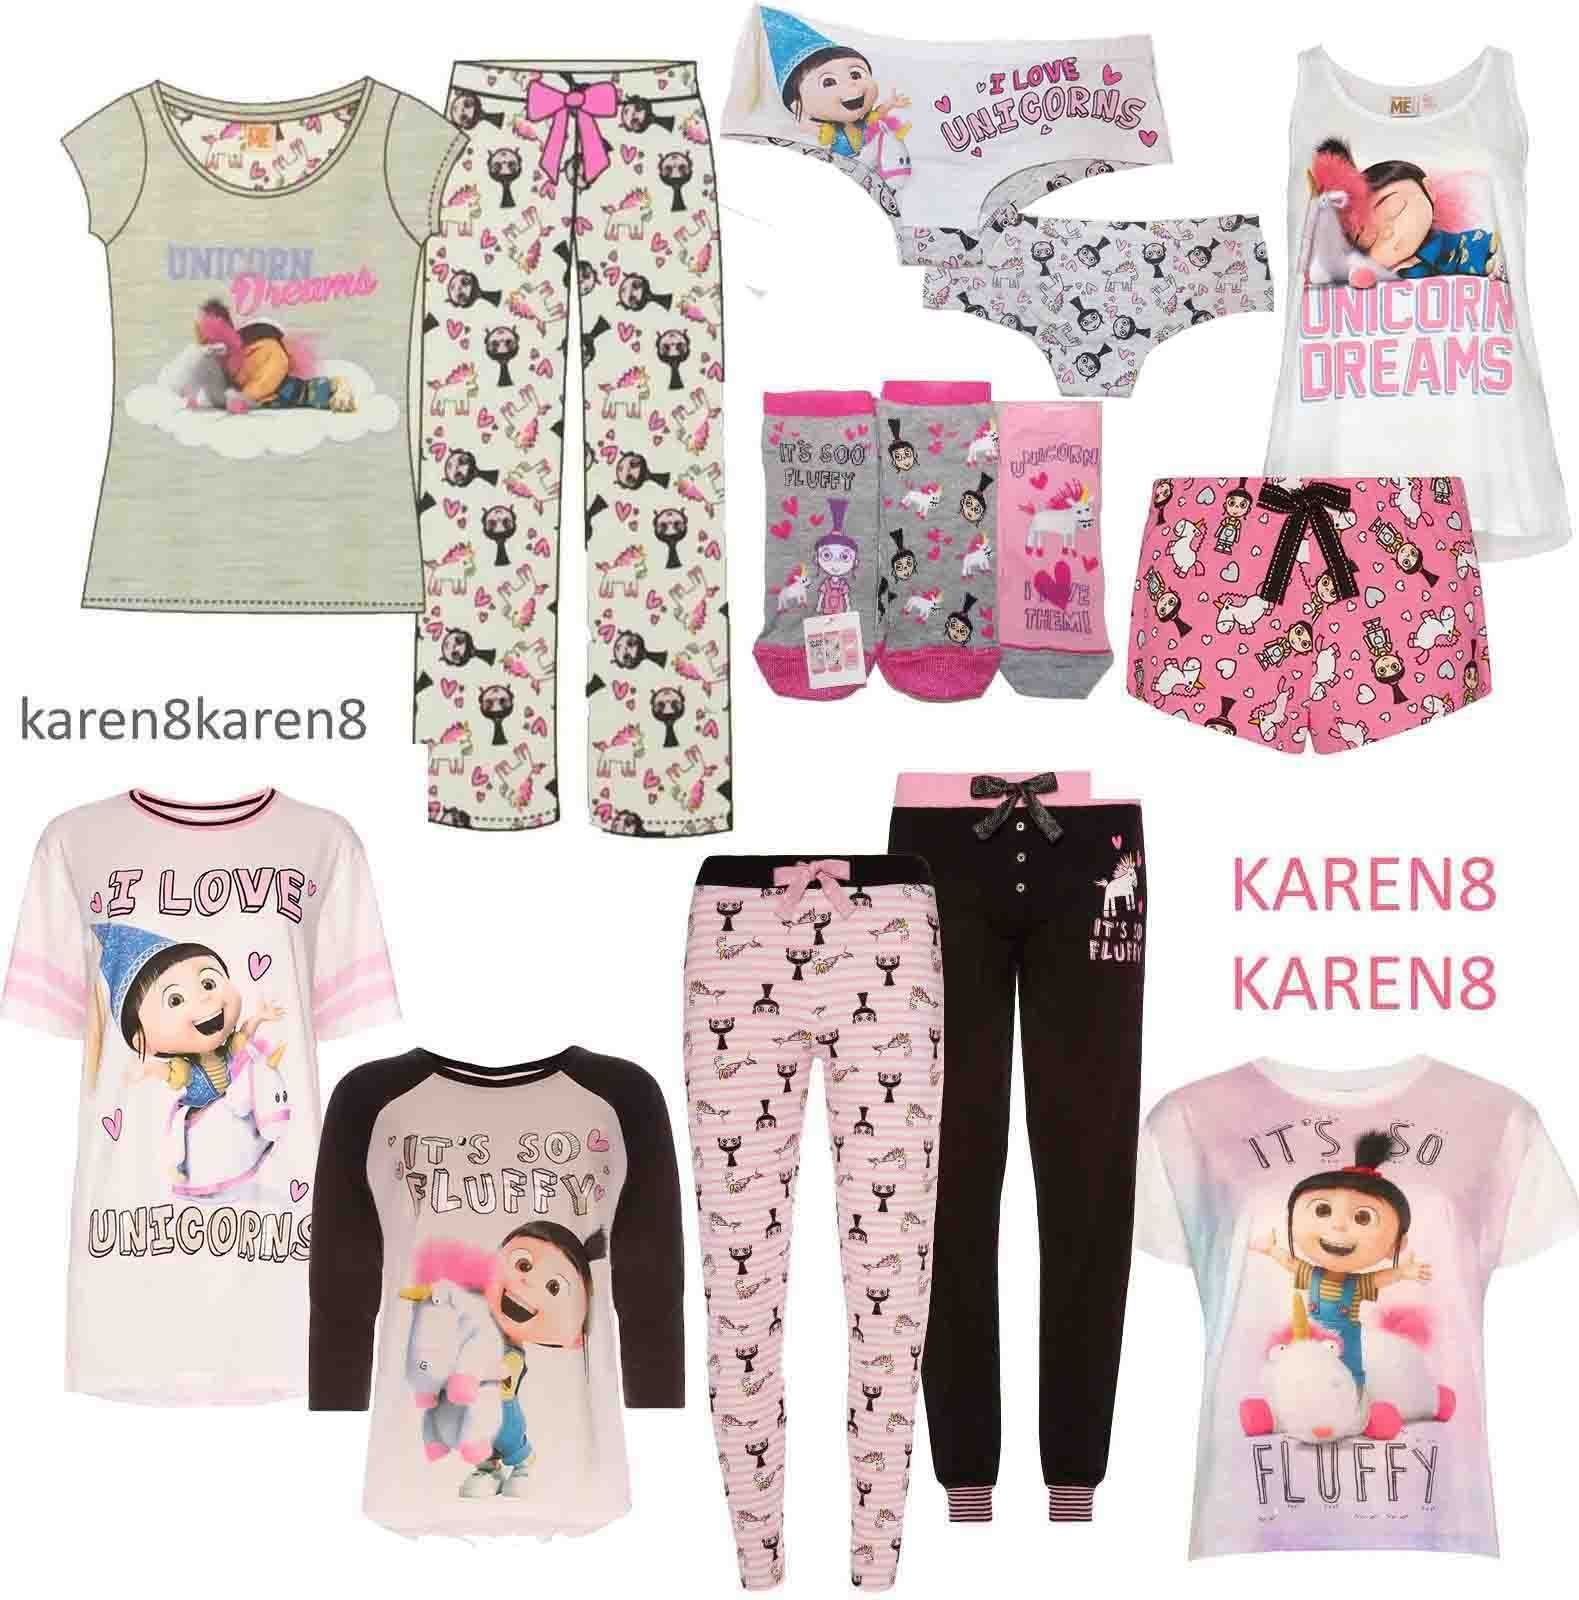 323fd510c Agnes Despicable Me Unicorn Dreams It's So Fluffy & I Love Unicorns Pyjamas  Knickers Socks